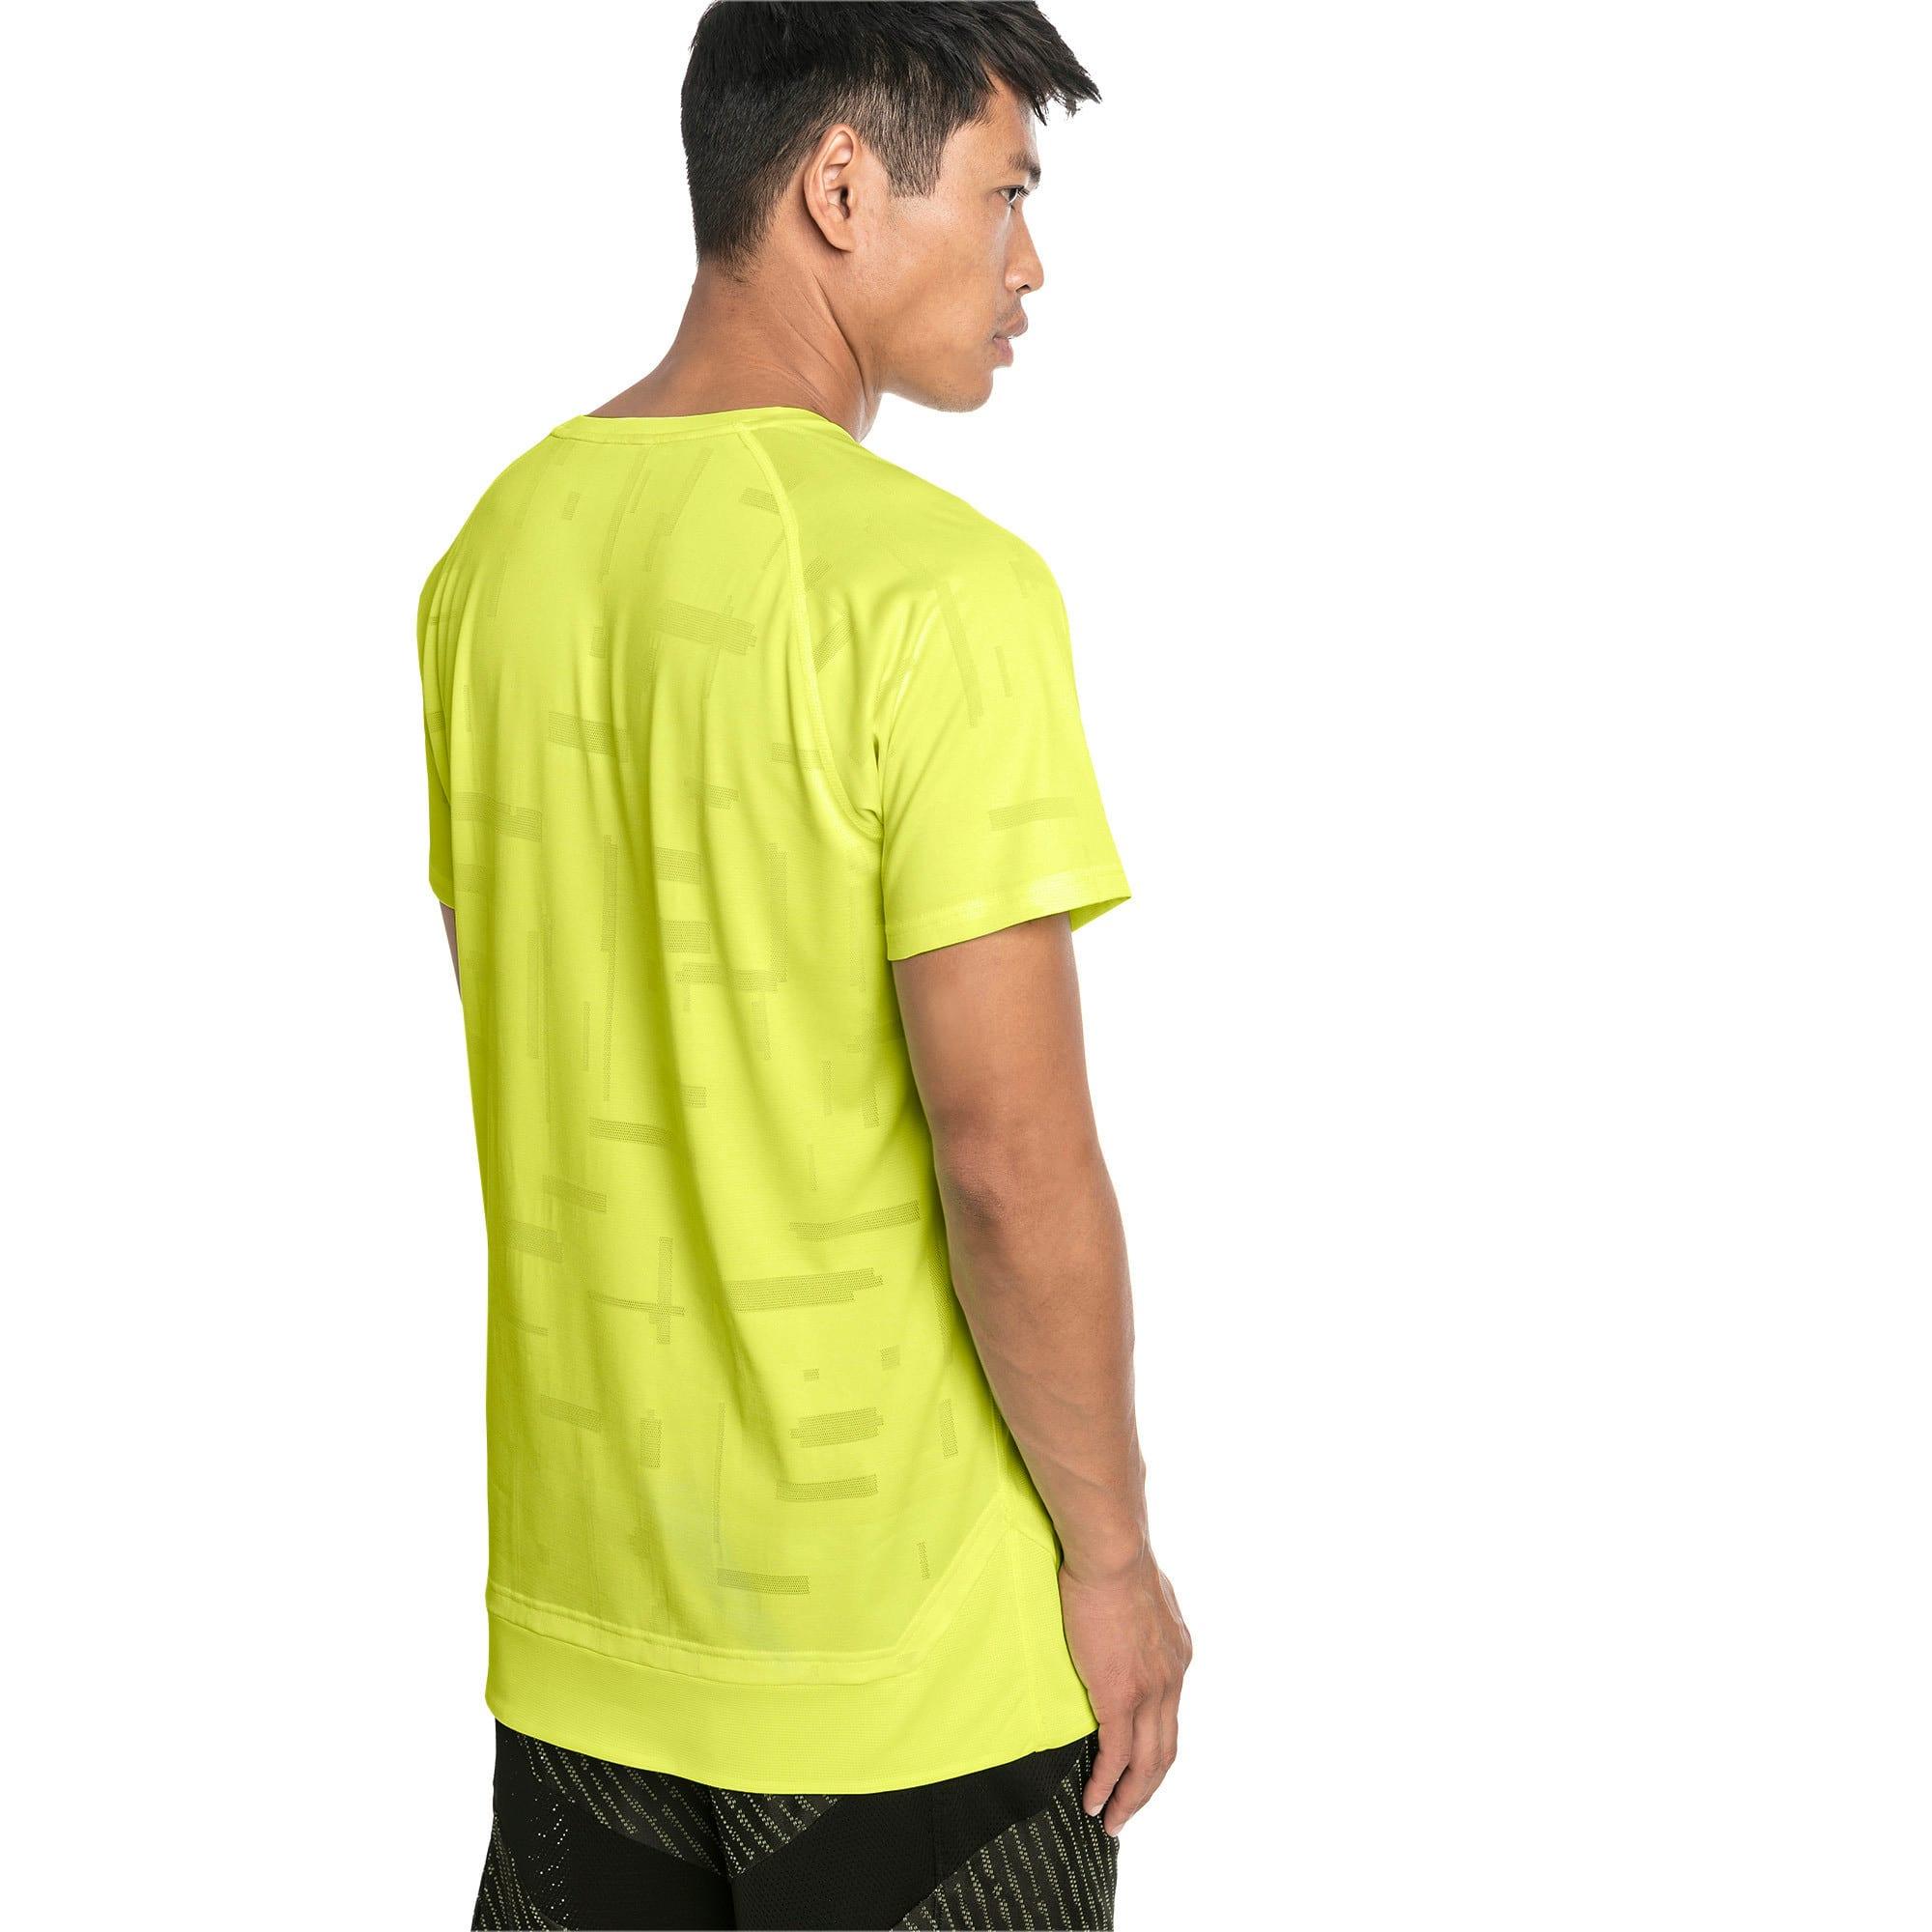 Thumbnail 2 of Energy Short Sleeve Tech Men's Training Tee, Fizzy Yellow, medium